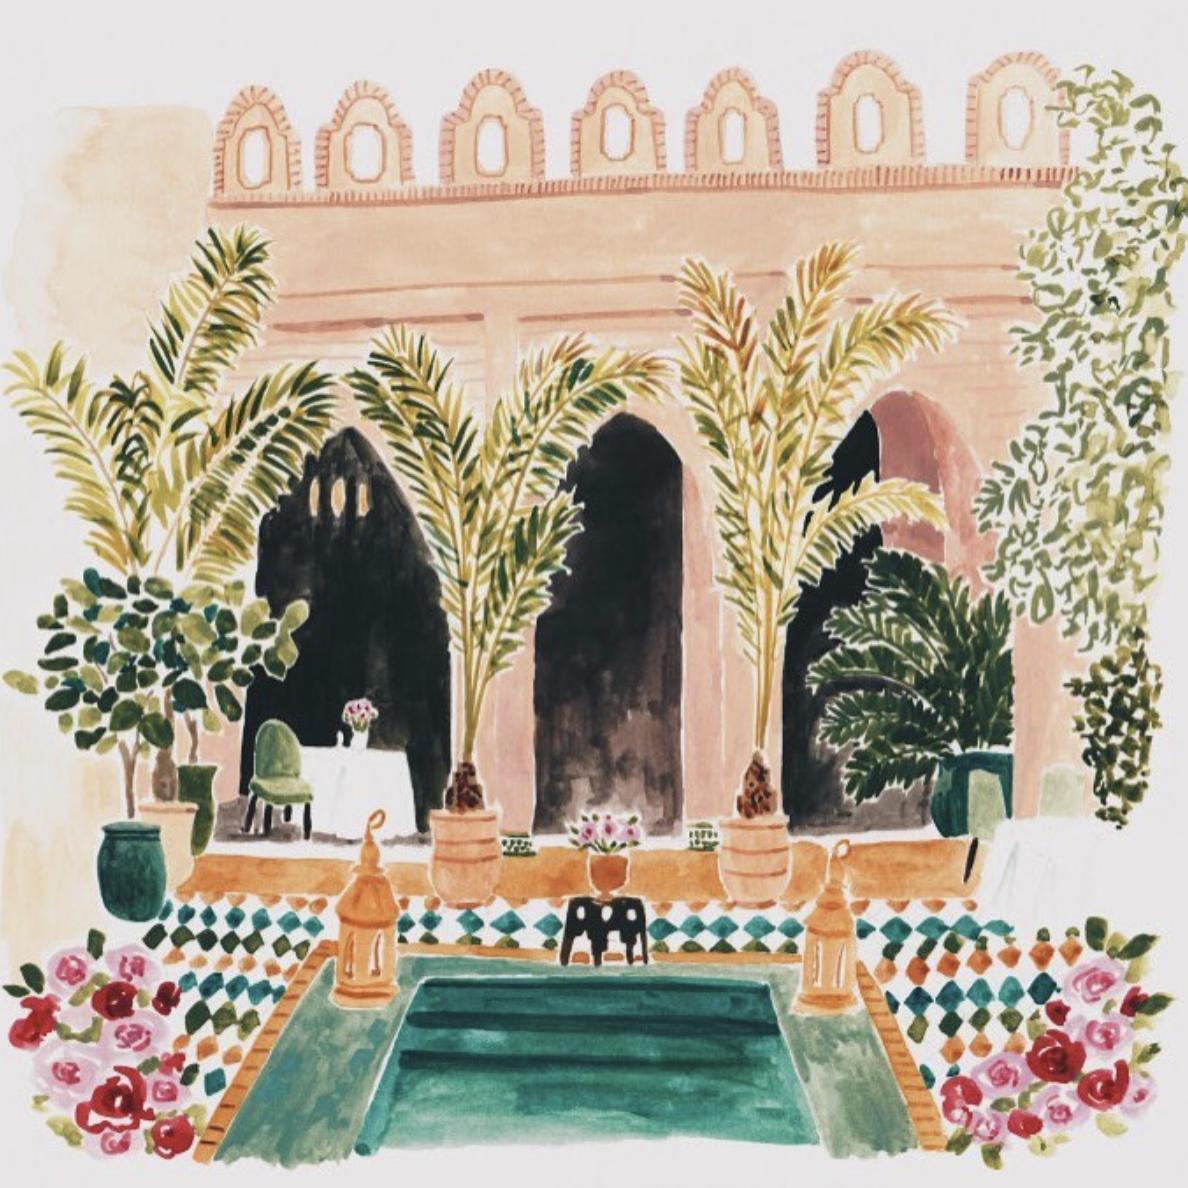 A riad in Marrakech  by Rosie Harbottle.